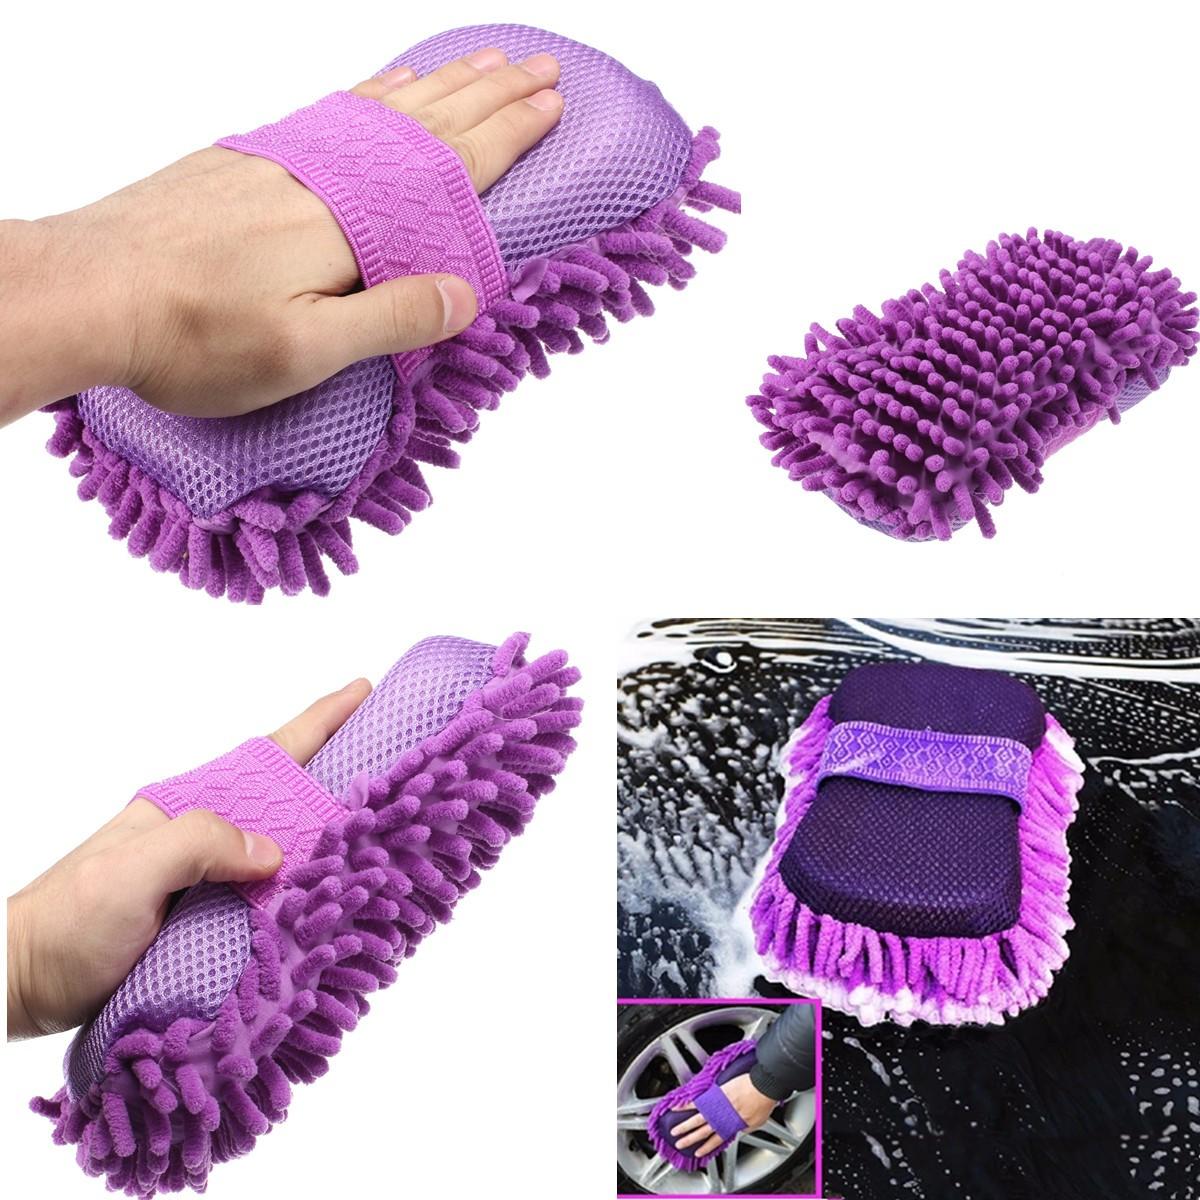 Microfiber Chenille Car Vehicle Care Washing Brush Sponge Pad Cleaning Tool